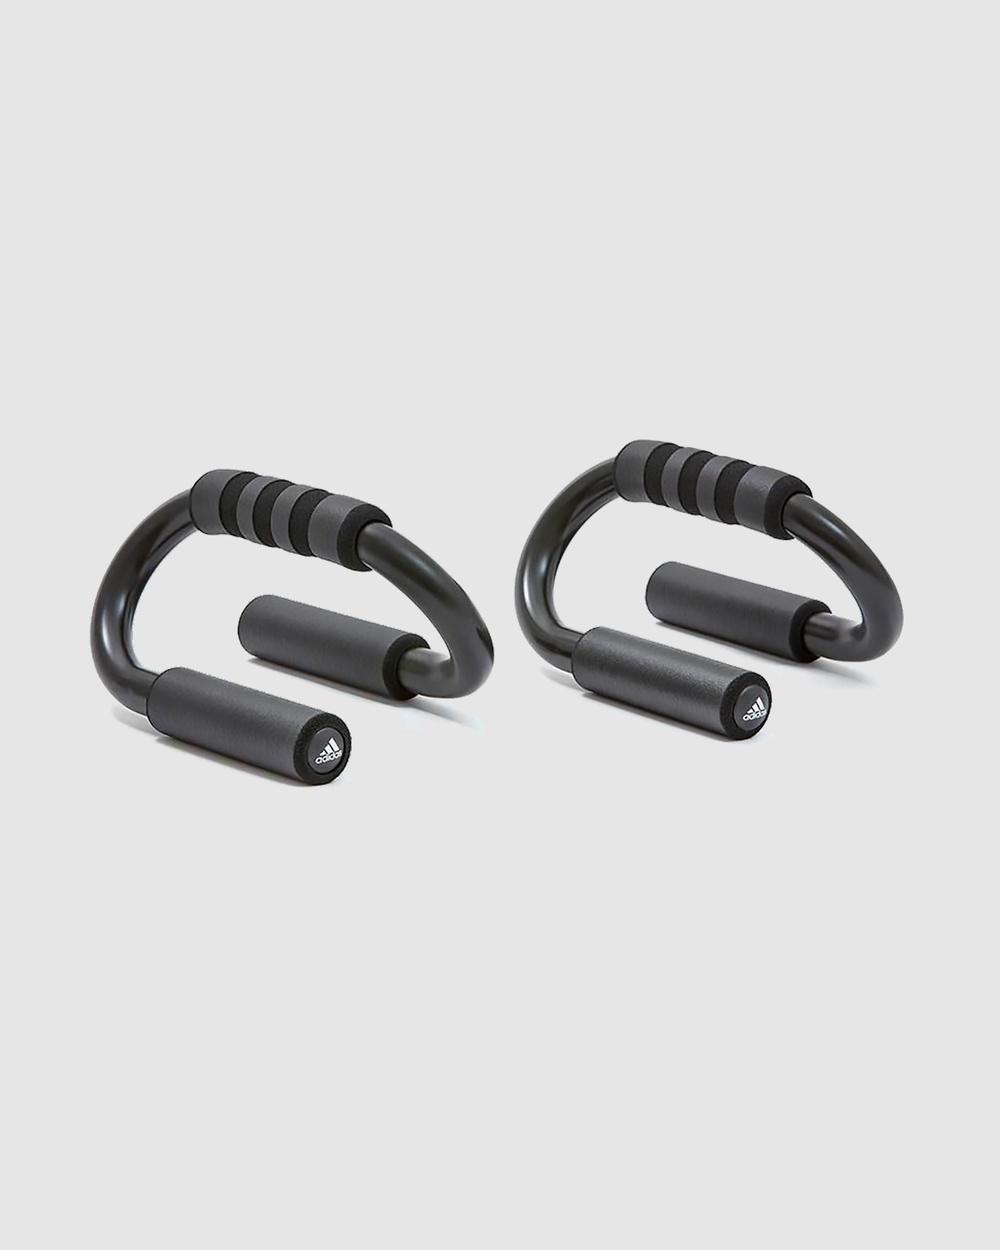 Adidas Push Up Bars Training Equipment Grey Australia